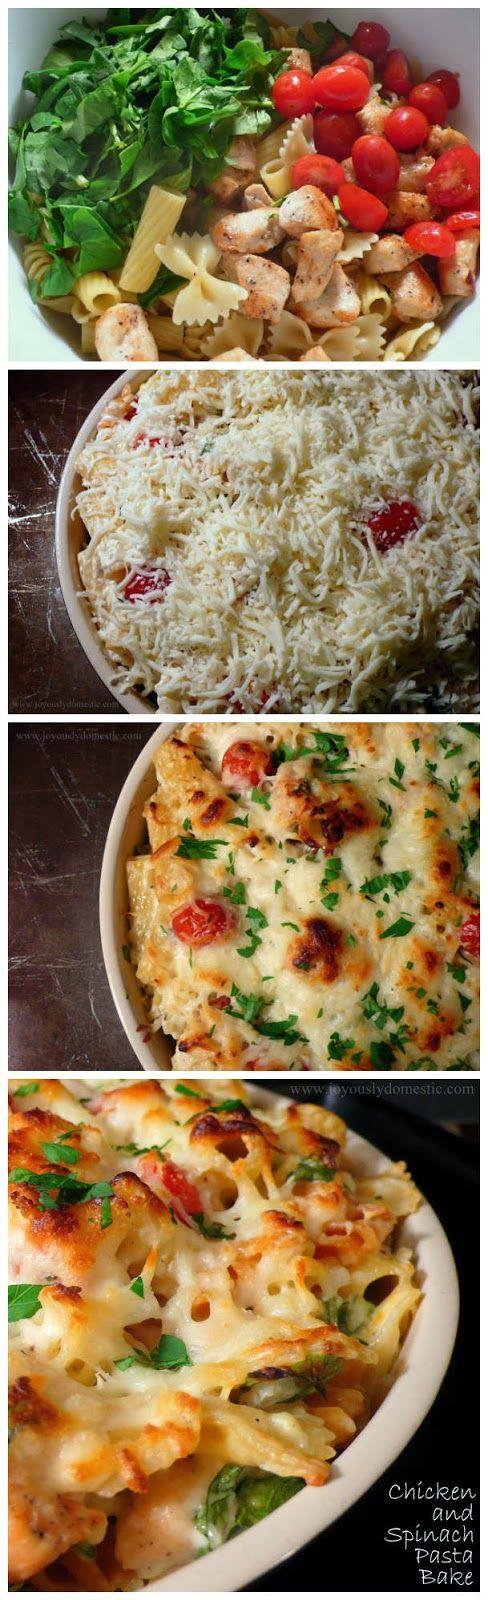 Chicken and Spinach Pasta Bake   Eatviews (Originally from Joyously Domestic Blog By: Angela Stevenson)  http://www.eatviews.com/2013/11/chicken-and-spinach-pasta-bake.html